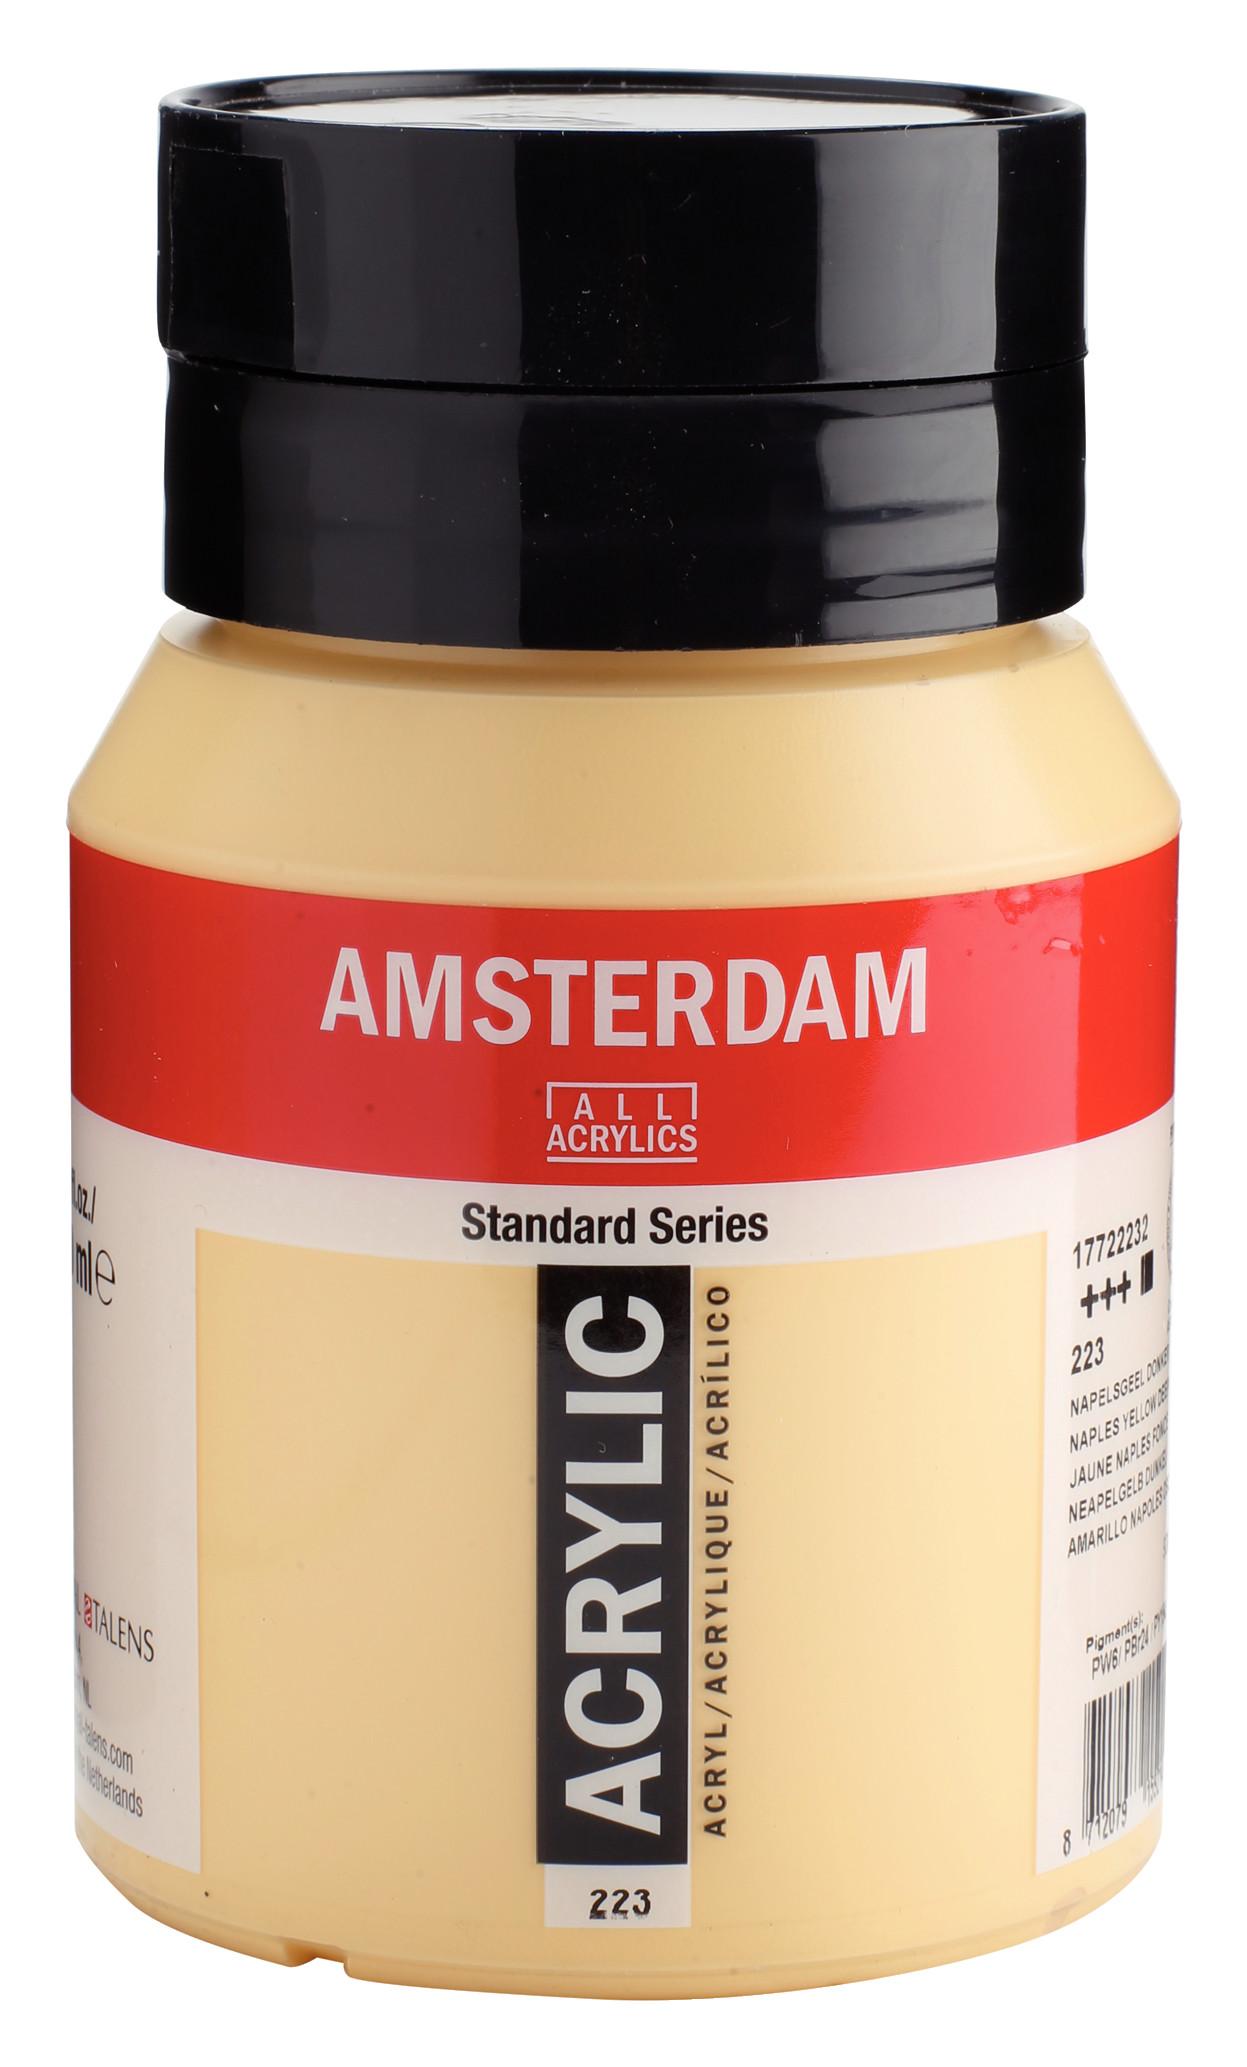 Amsterdam Standard Series Acrylic Jar 500 ml Naples yellow deep 223